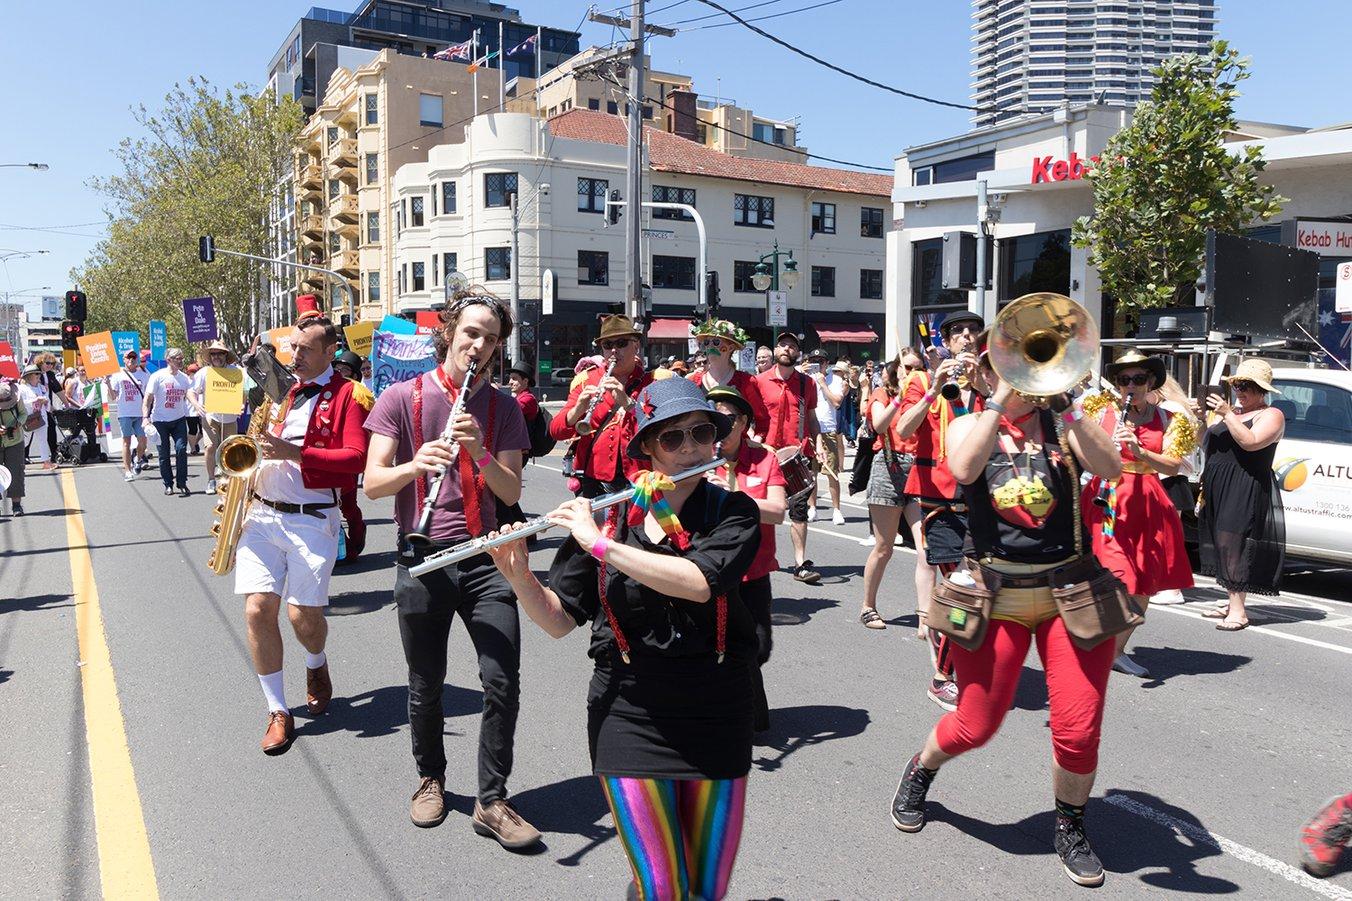 20170202_Pride March_Paul Rees_RE-SIZED_021.jpg